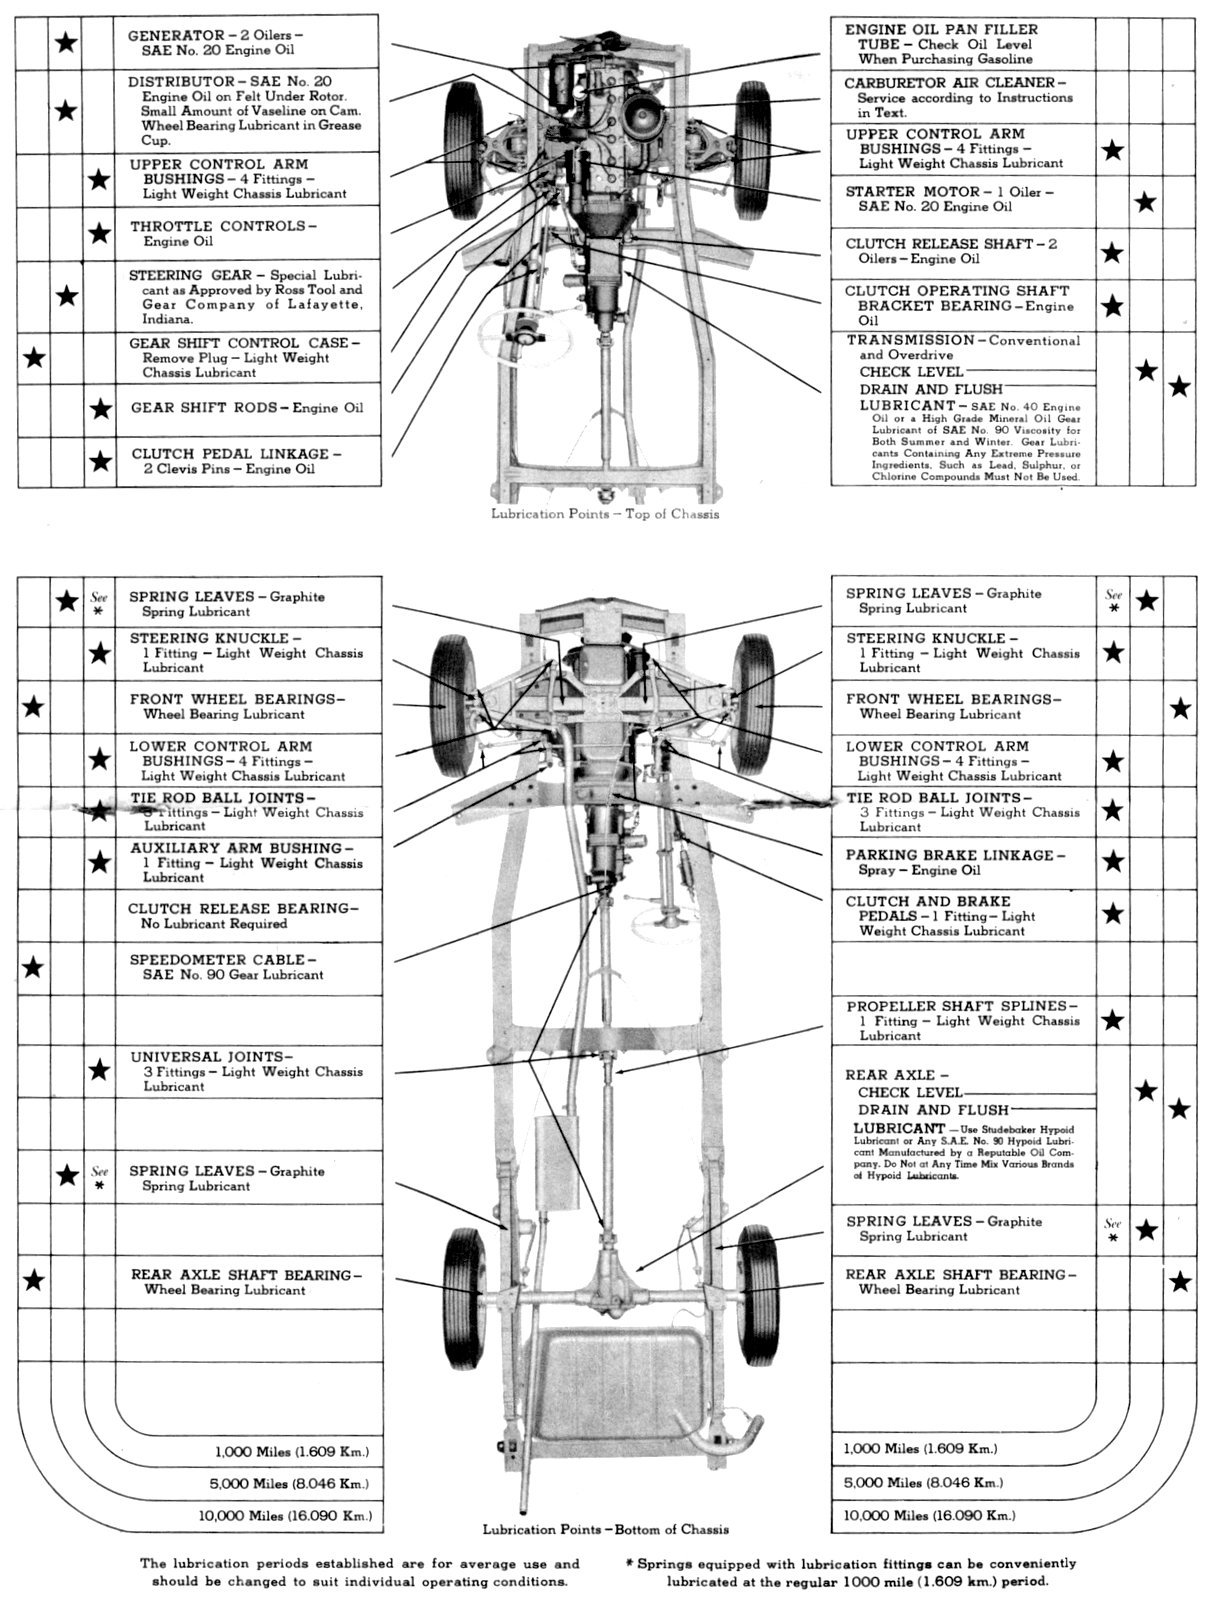 1948 Studebaker Owner's Manual (1)